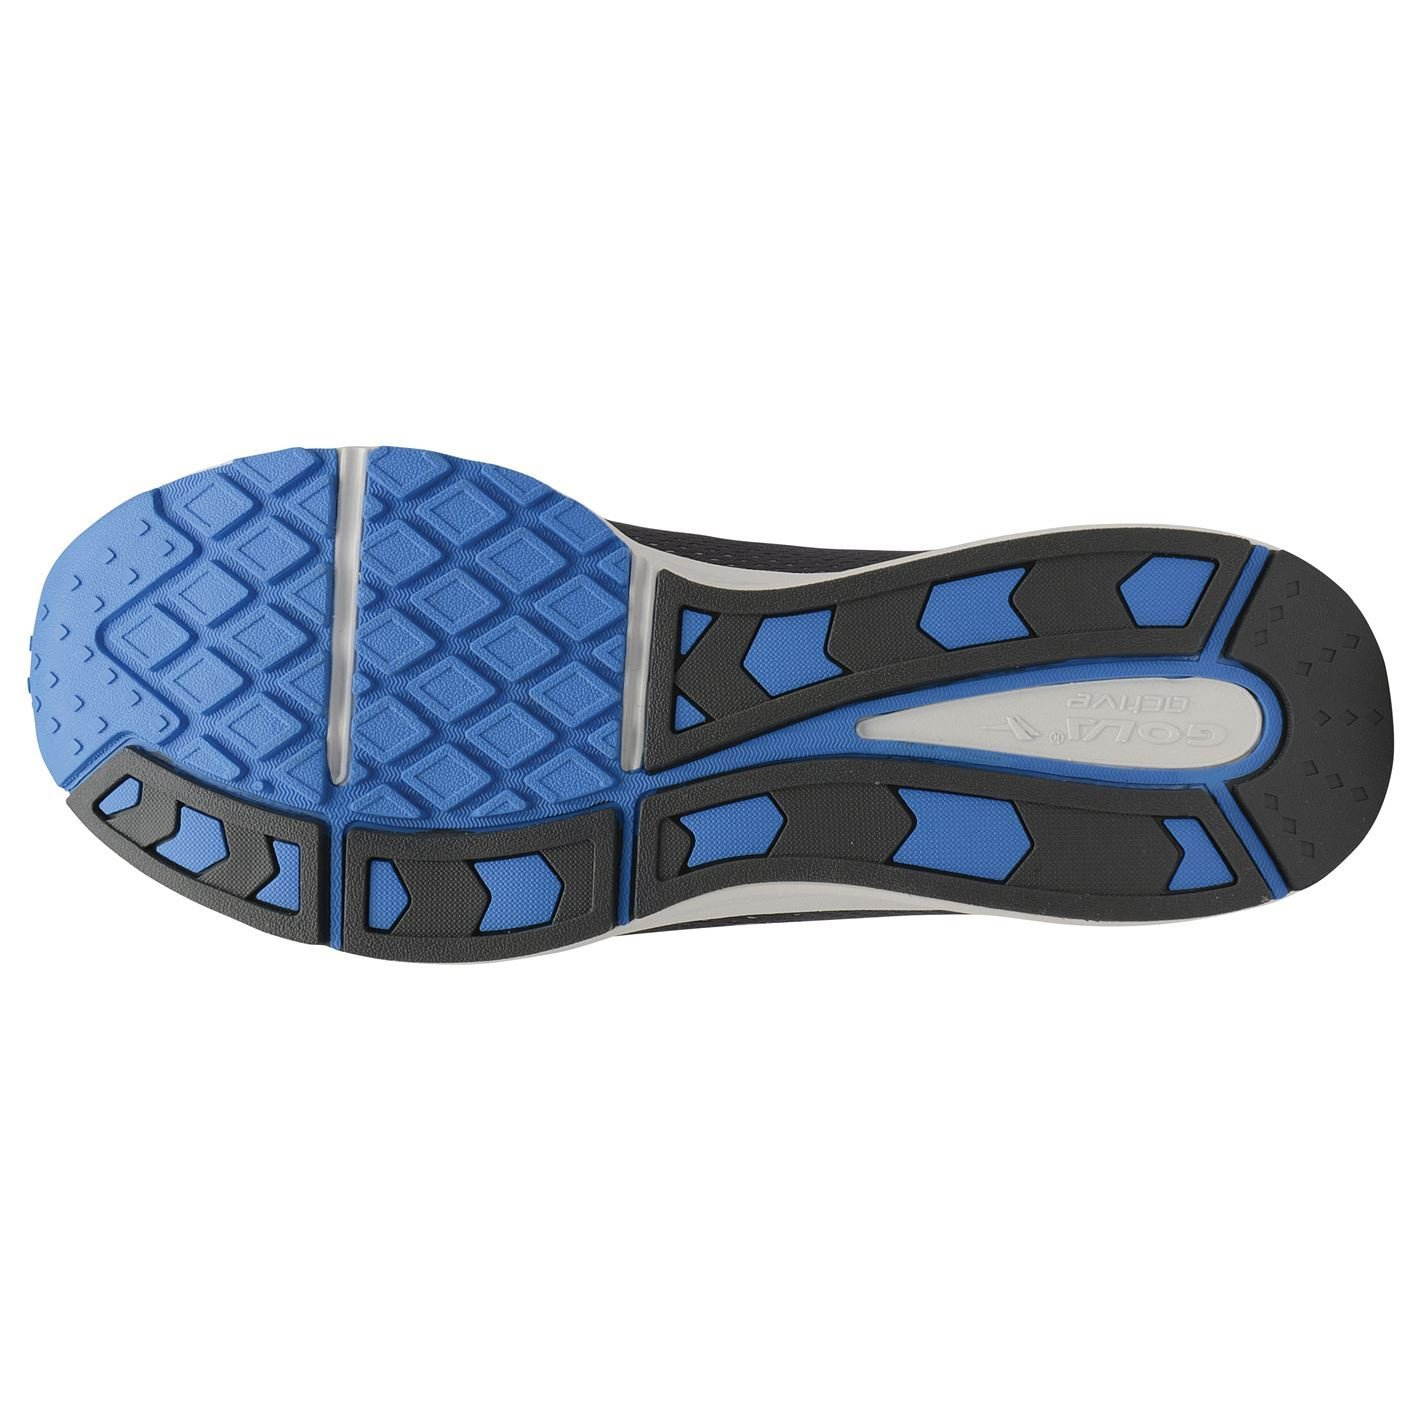 Original schuhe Gola Zenith, Herren Laufschuhe, Laufschuhe, Laufschuhe, Schwarz Blau, Jogging Fitness, Trainingsschuhe, Turnschuhe 4ced9e